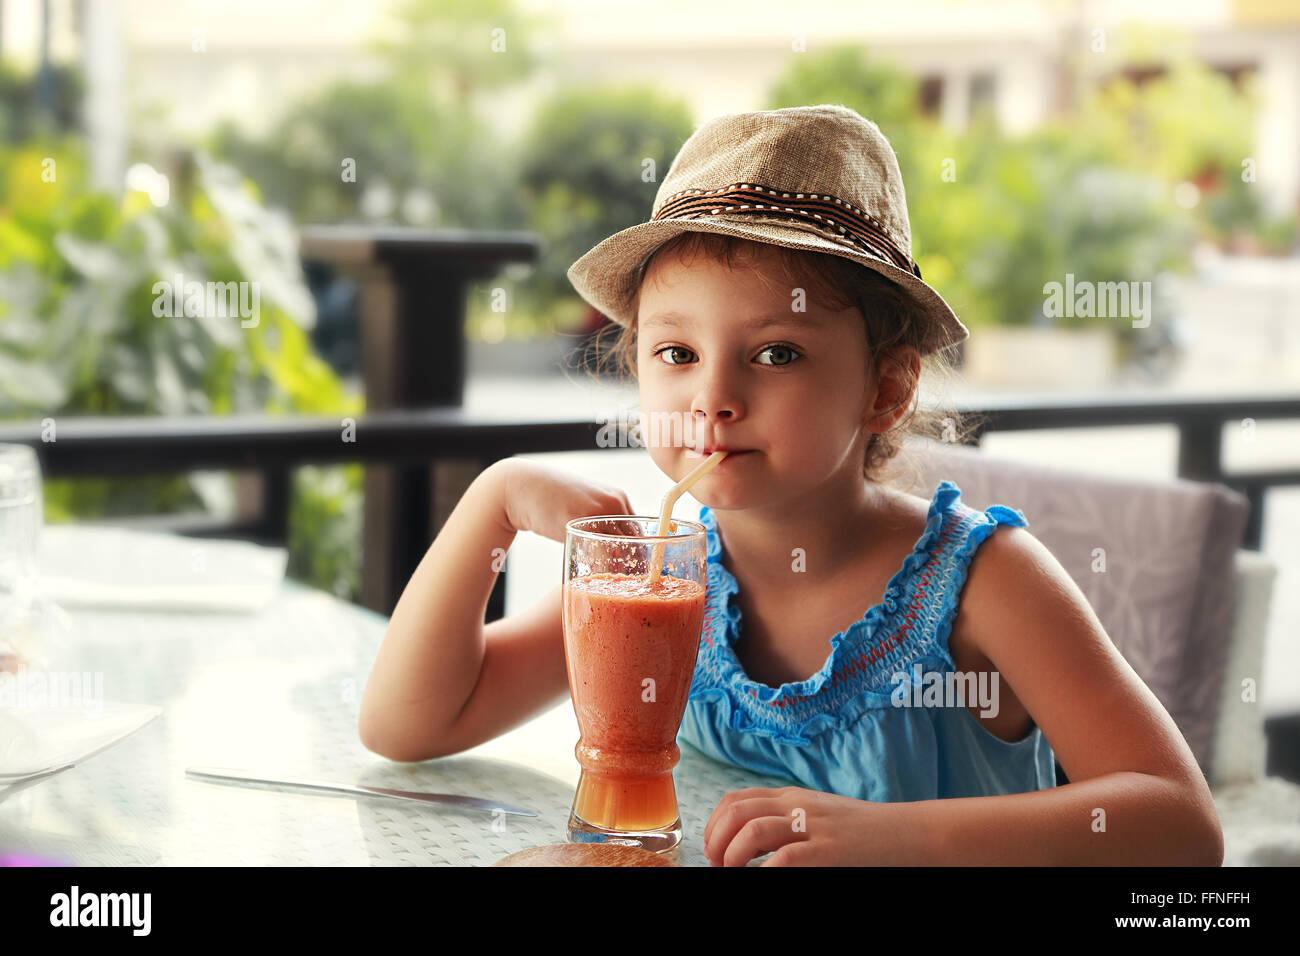 Fun kid girl in fashion hat drinking smoothie juice in street restaurant - Stock Image